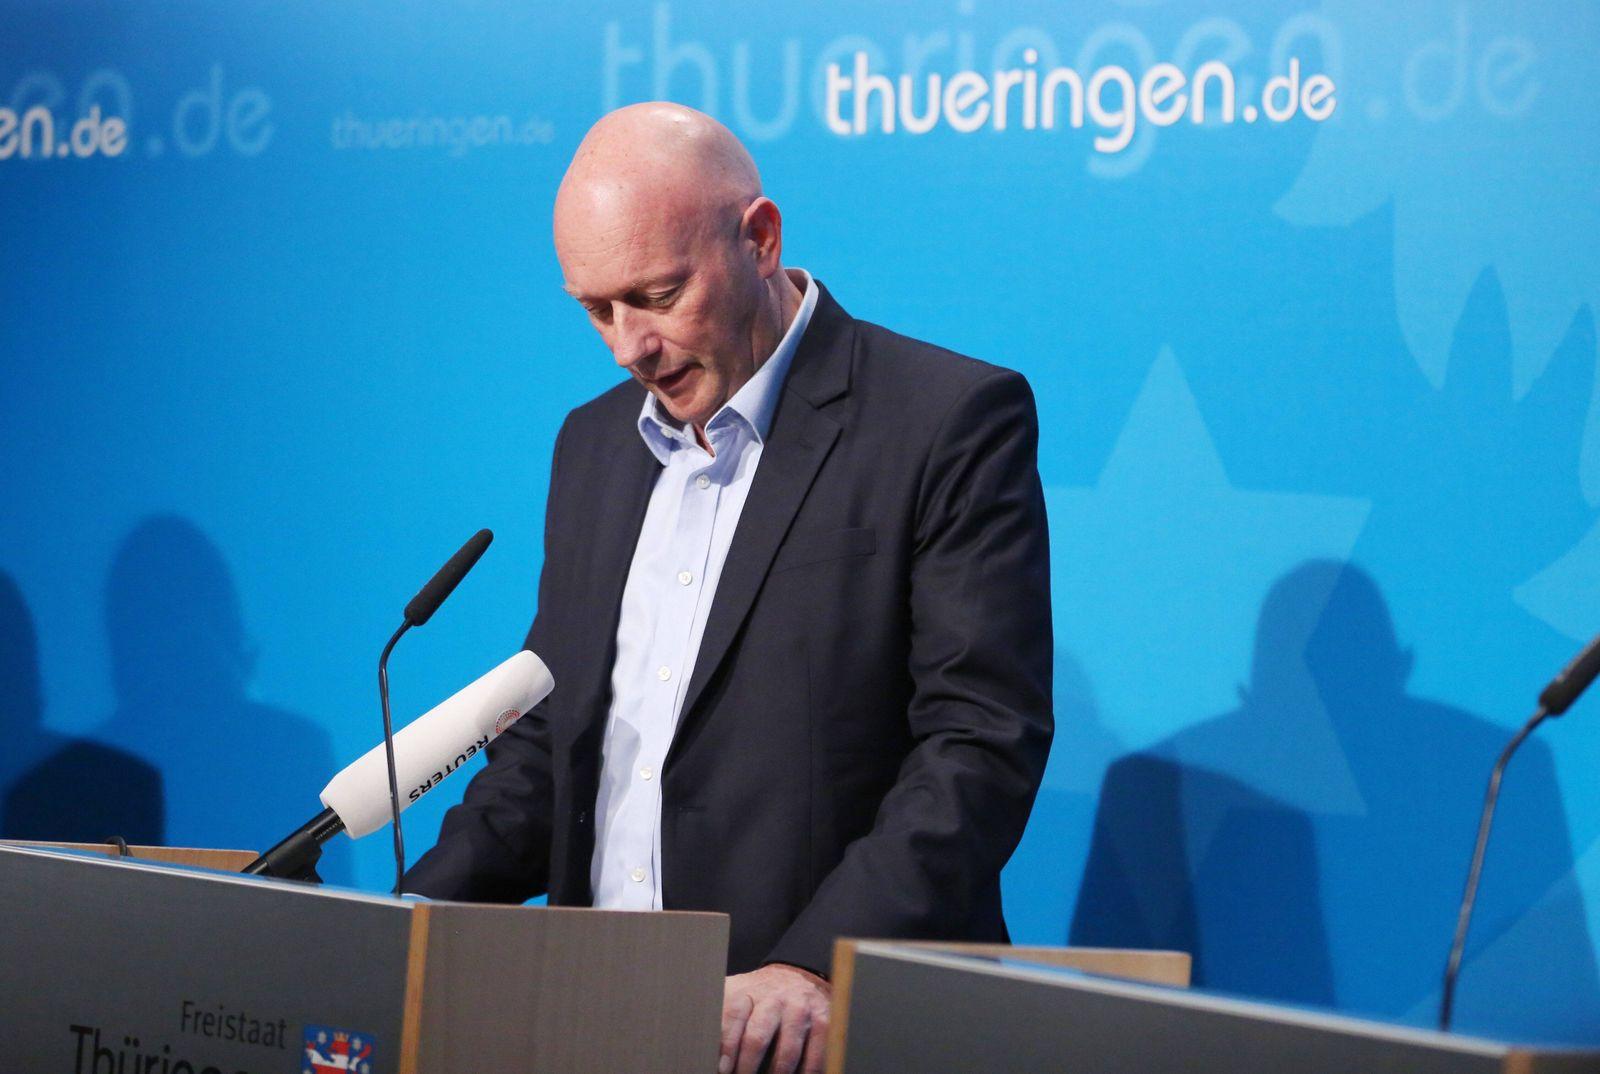 News Bilder des Tages PK Kemmerich 06.02.2020 , Erfurt, Thüringer Staatskanzlei, Pressekonferenz Thomas L. Kemmerich (FD